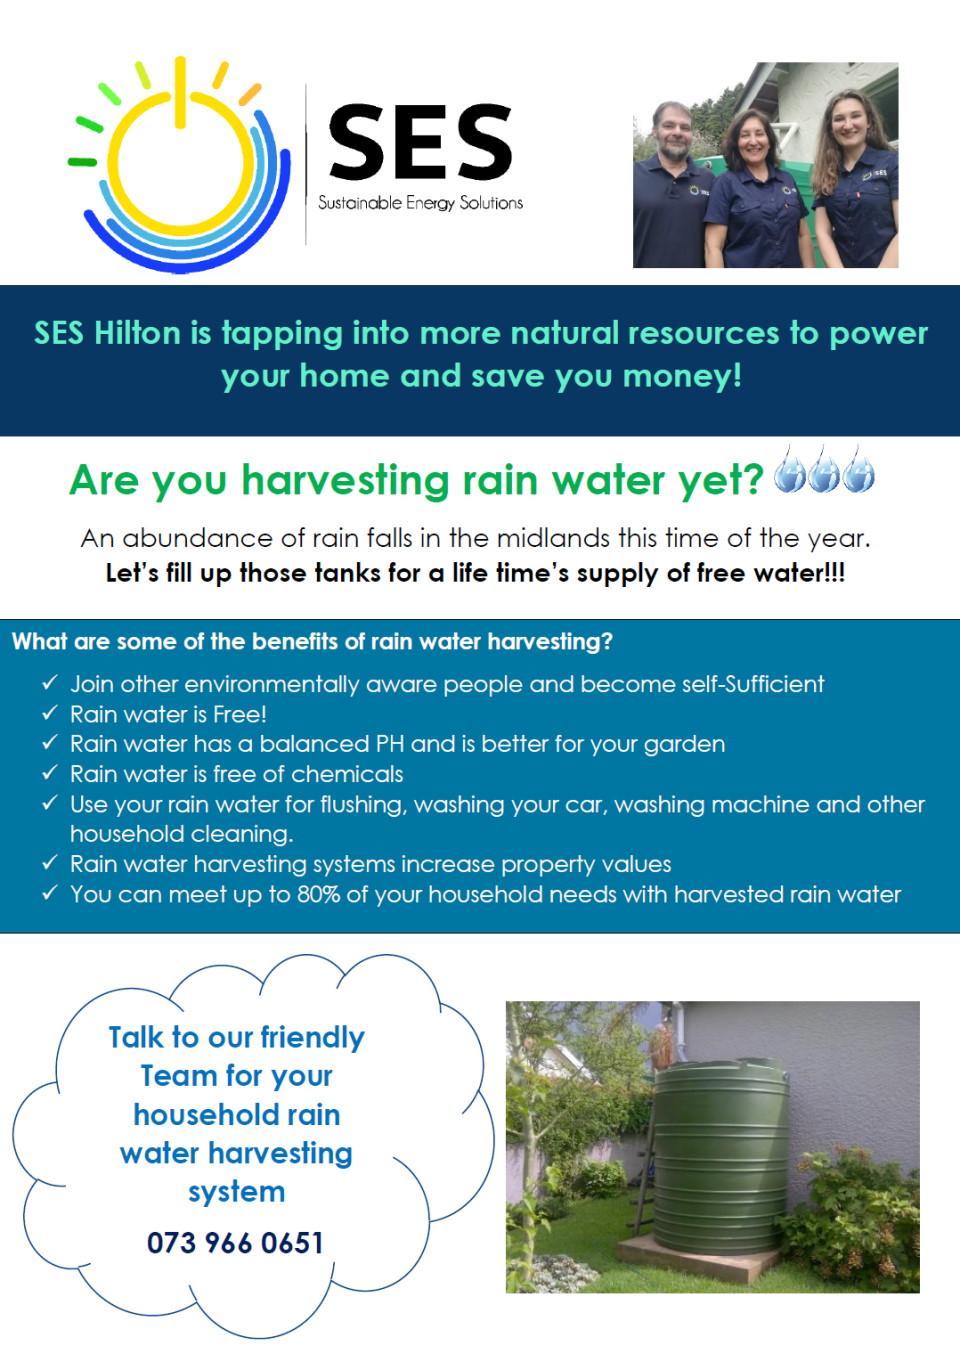 rainwater harvesting ses hilton copy copy